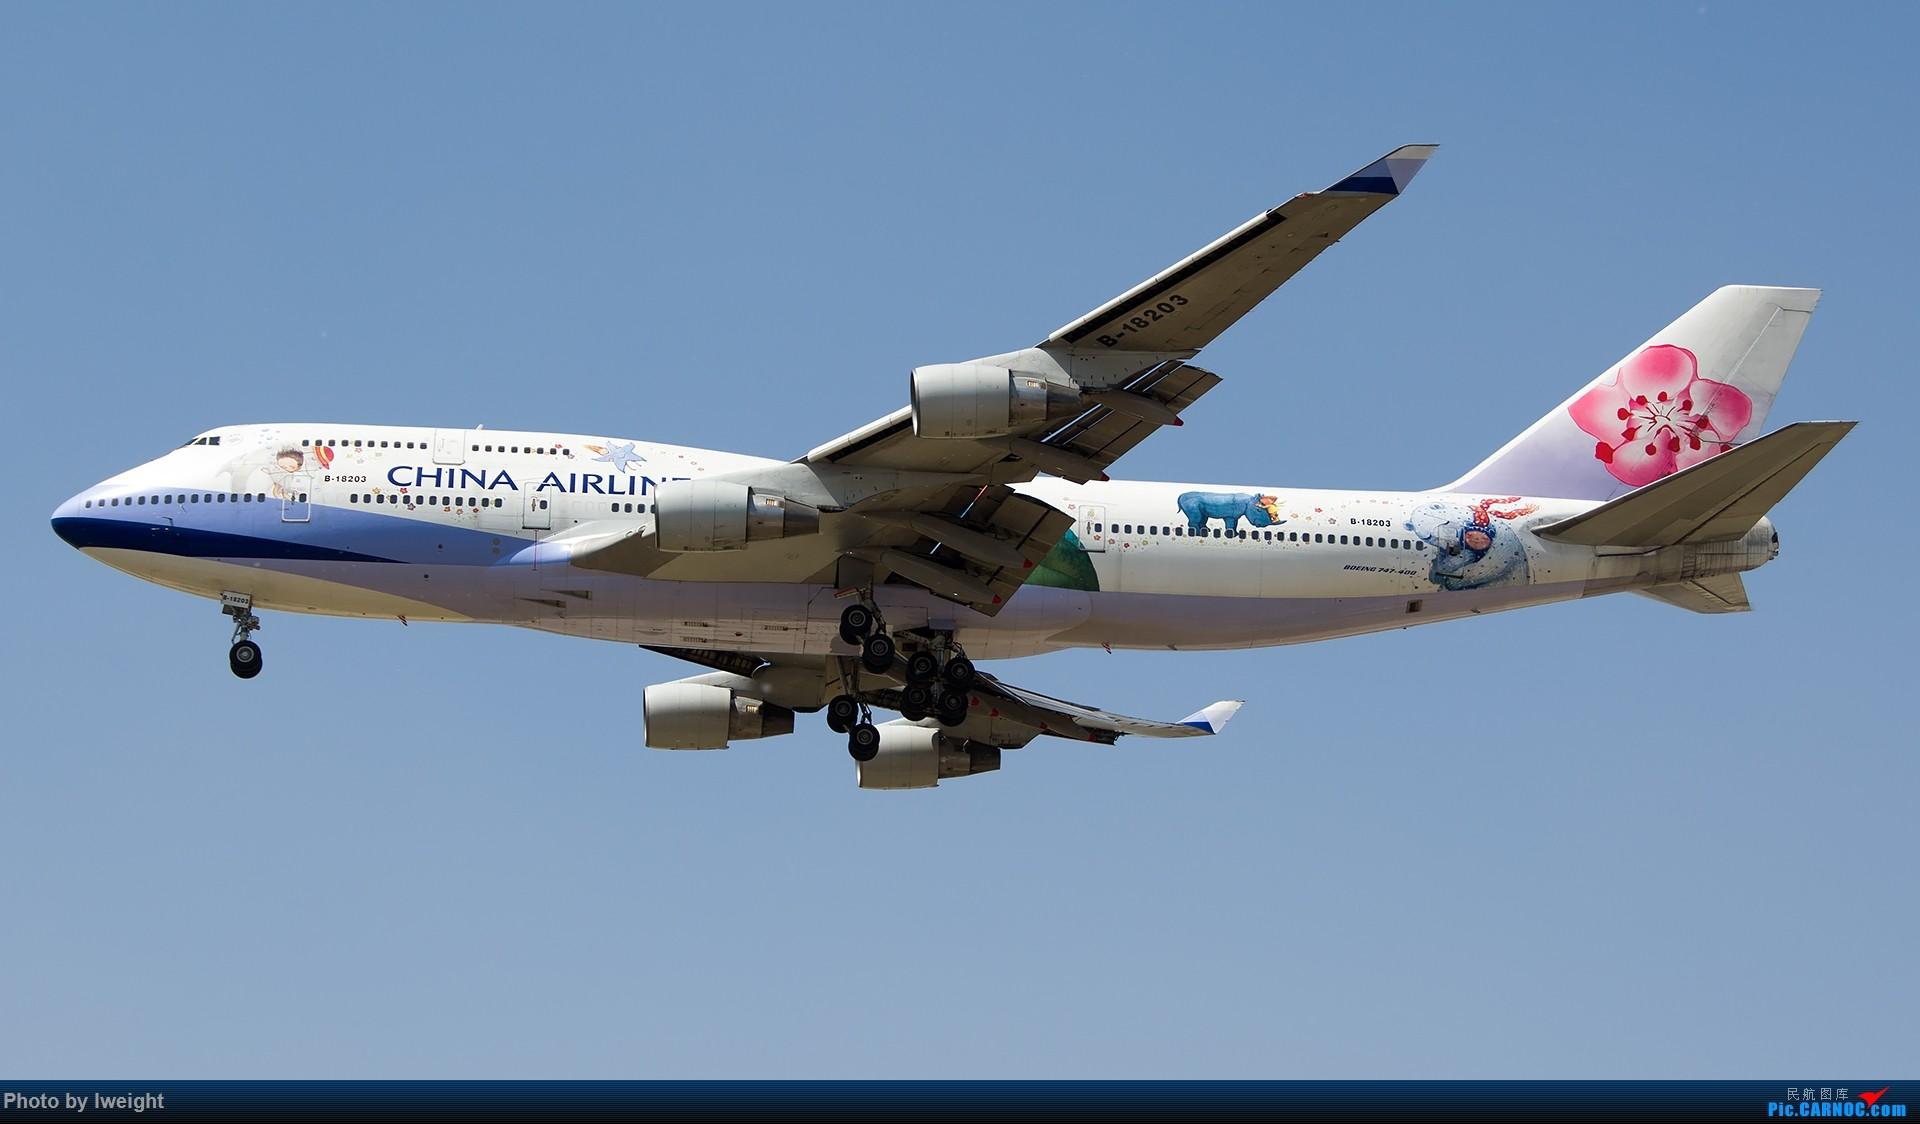 Re:[原创]2015年第一次在PEK拍北向南,其实是为Jimmy去的【2015-4-24】 BOEING 747-400 B-18203 中国北京首都国际机场